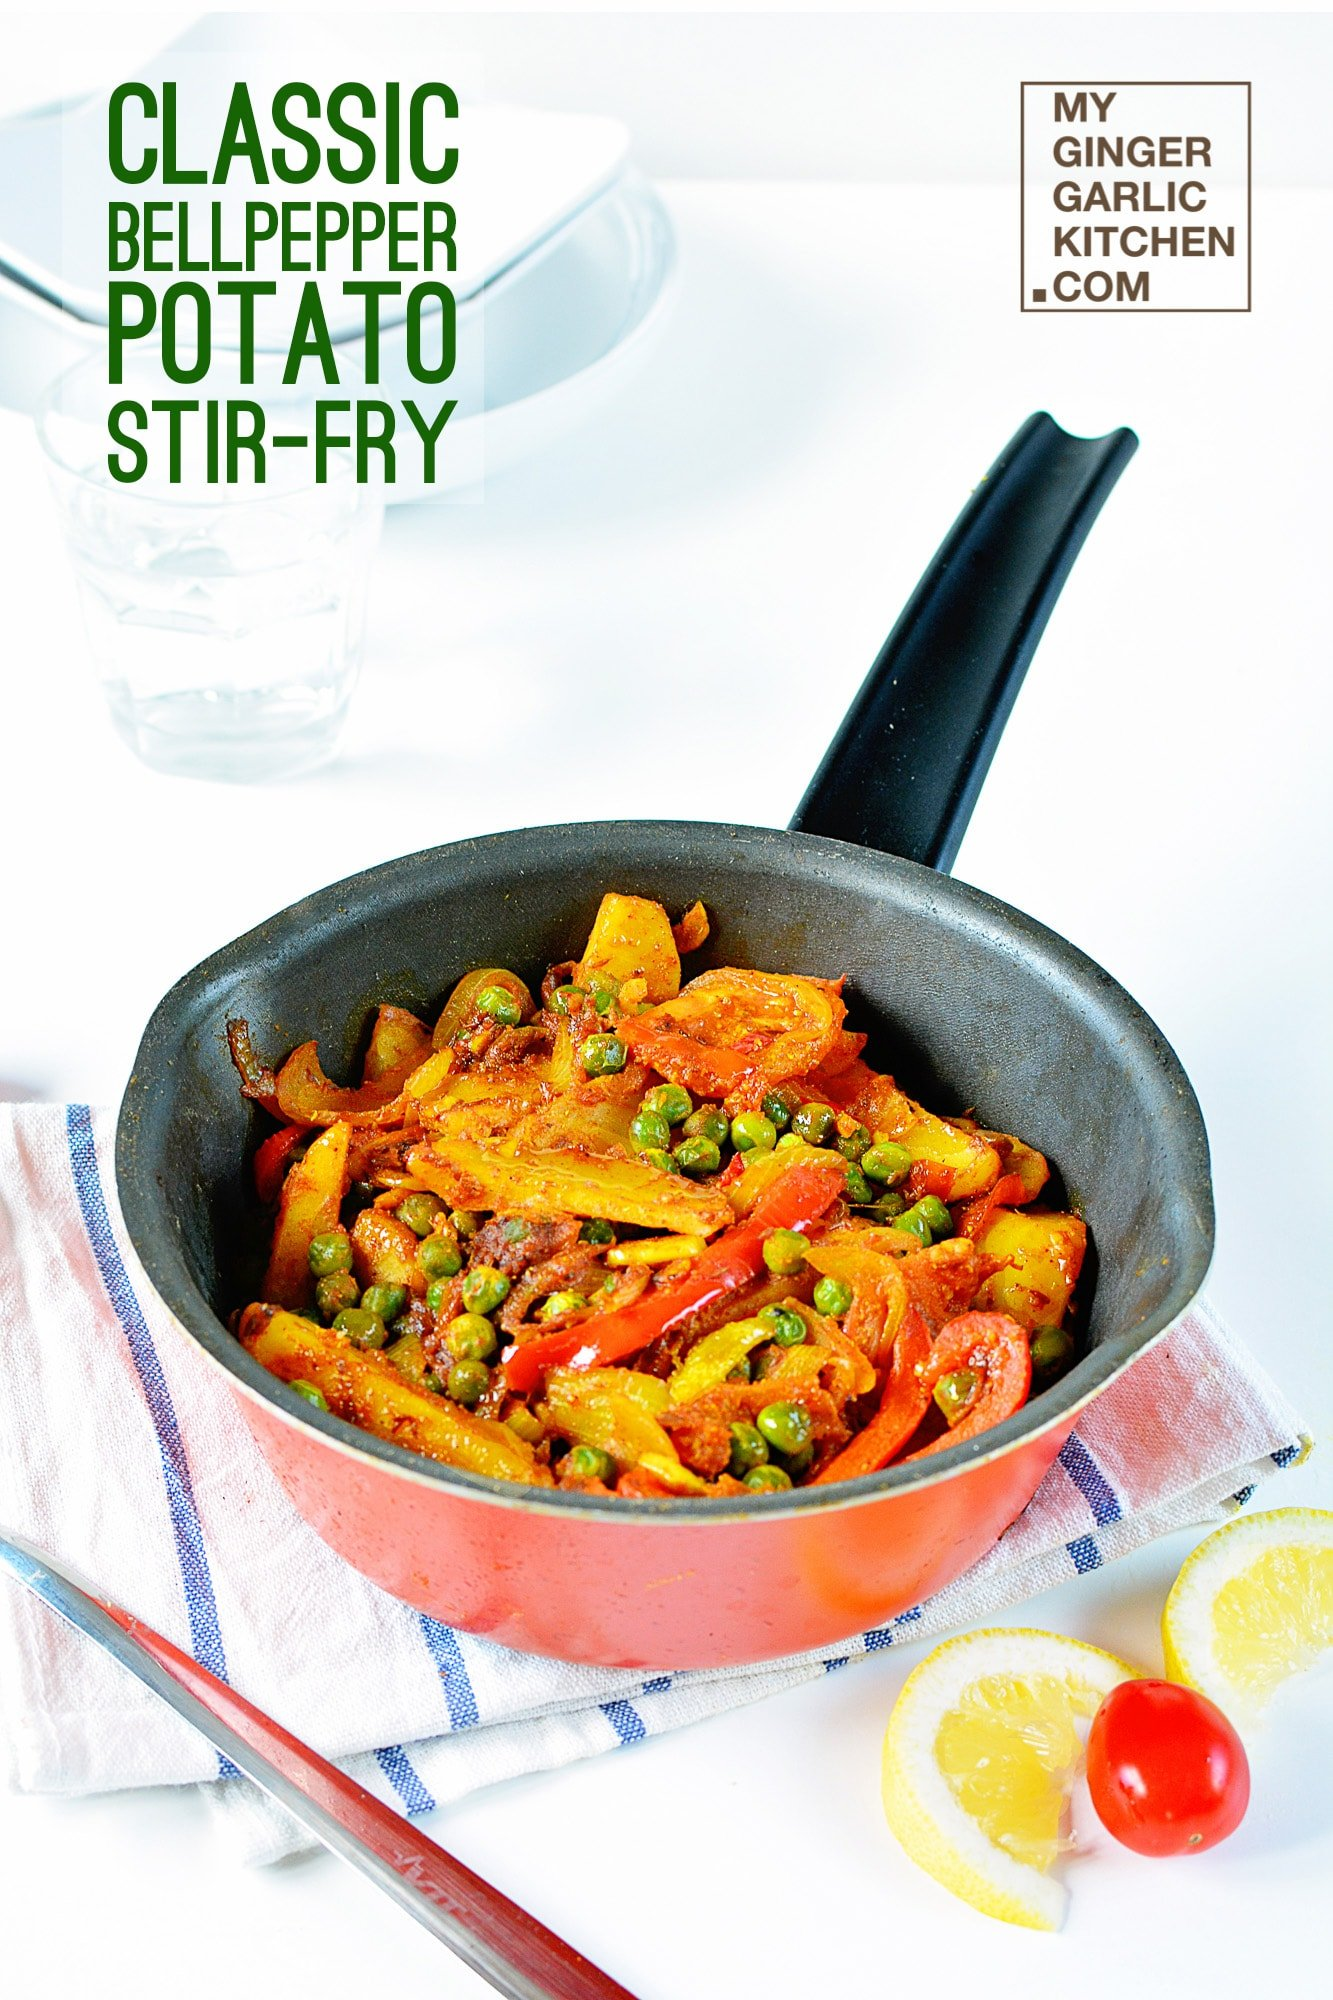 recipe-classic-bellpepper-potato-peas-stir-fry-anupama-paliwal-my-ginger-garlic-kitchen-1